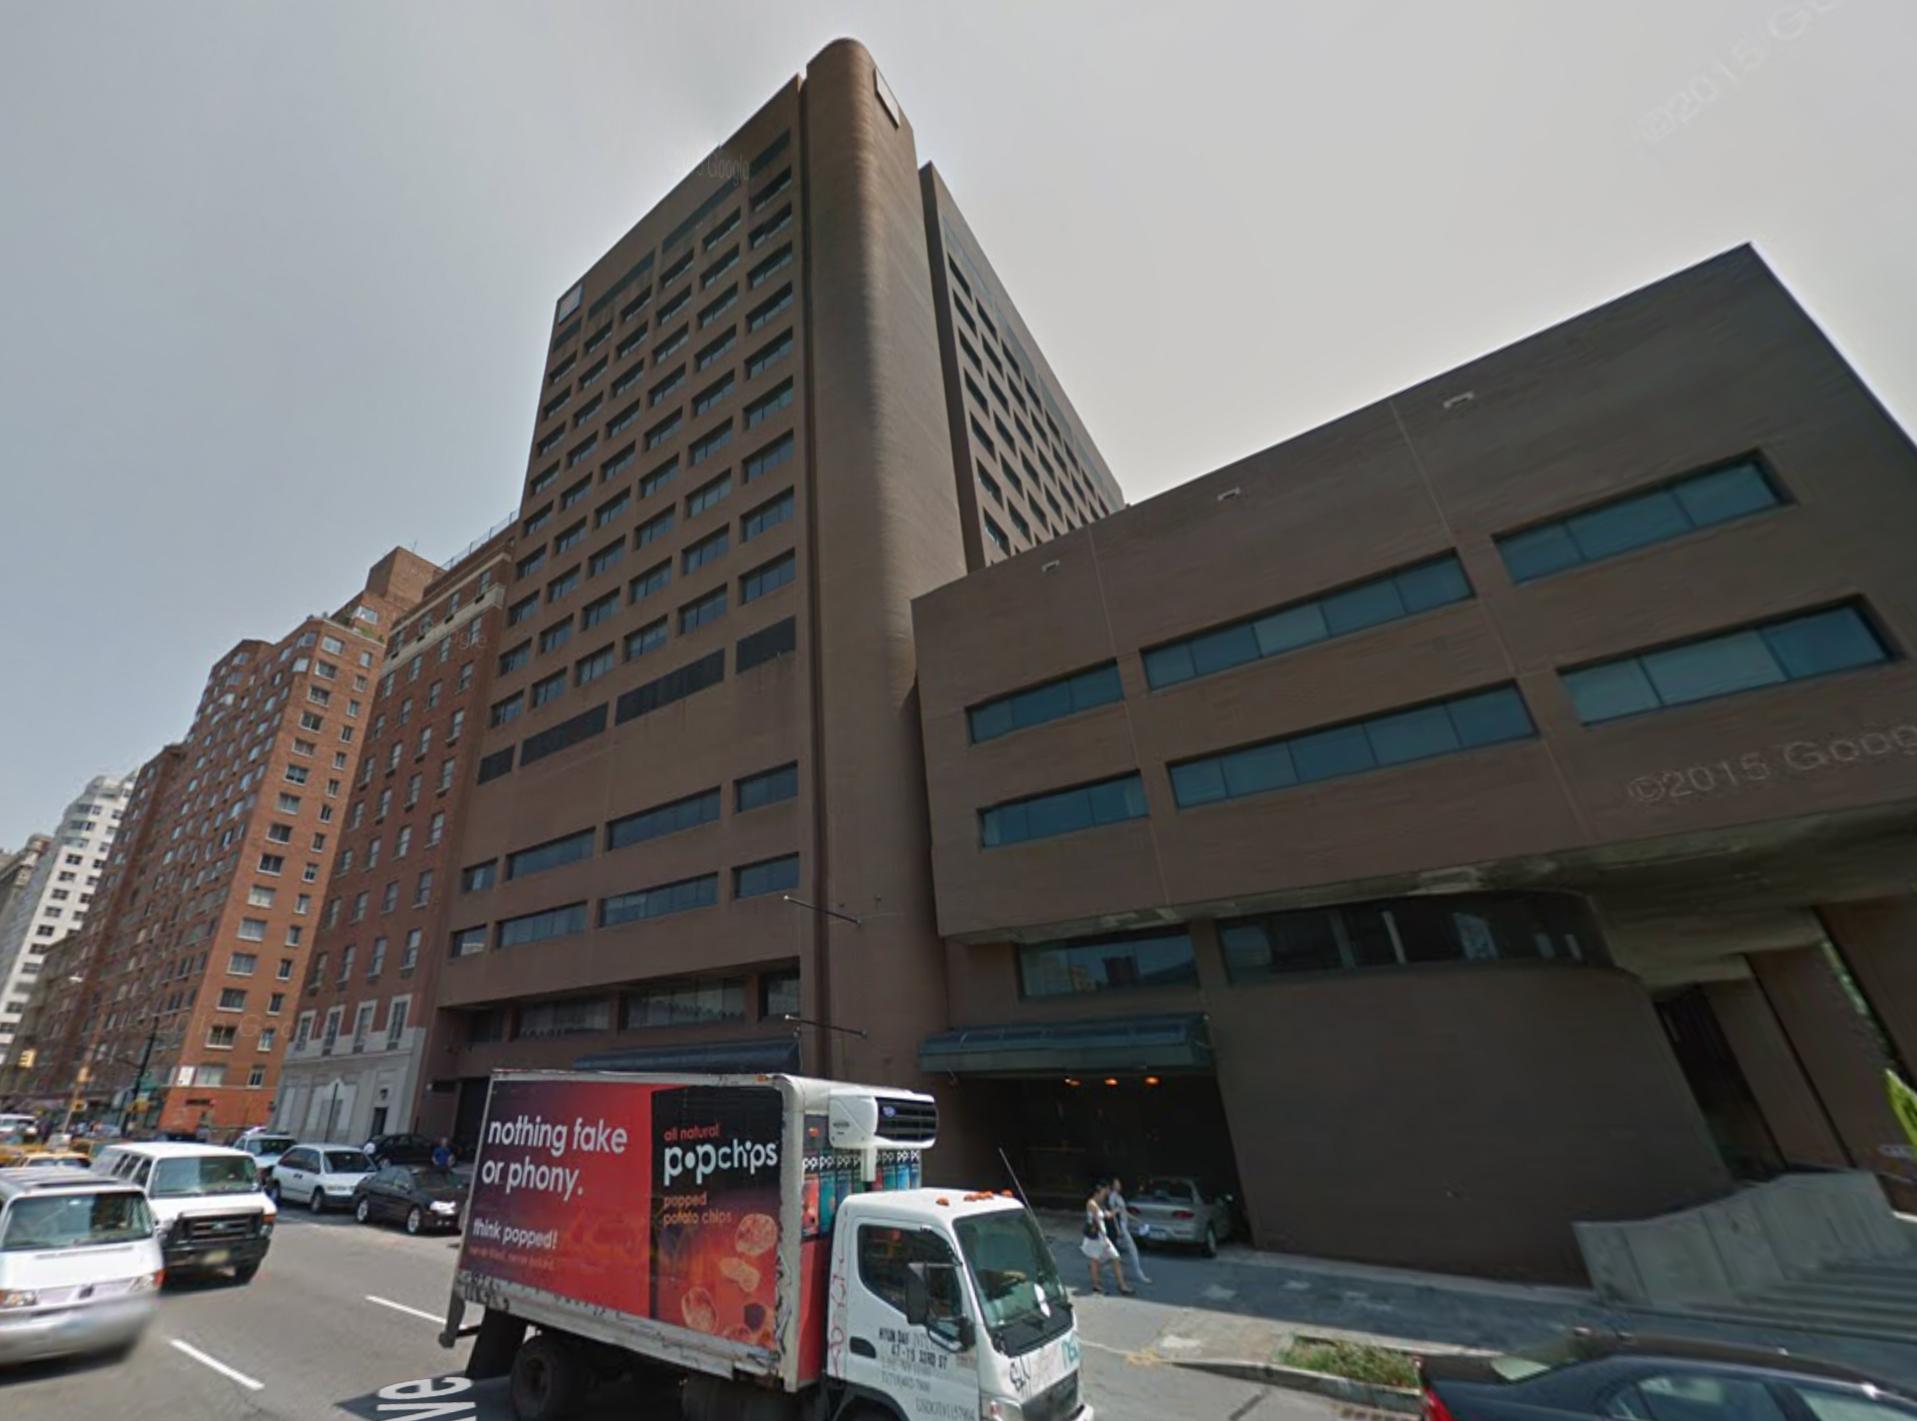 1 Seventh Avenue in July of 2011. Via Google Maps.